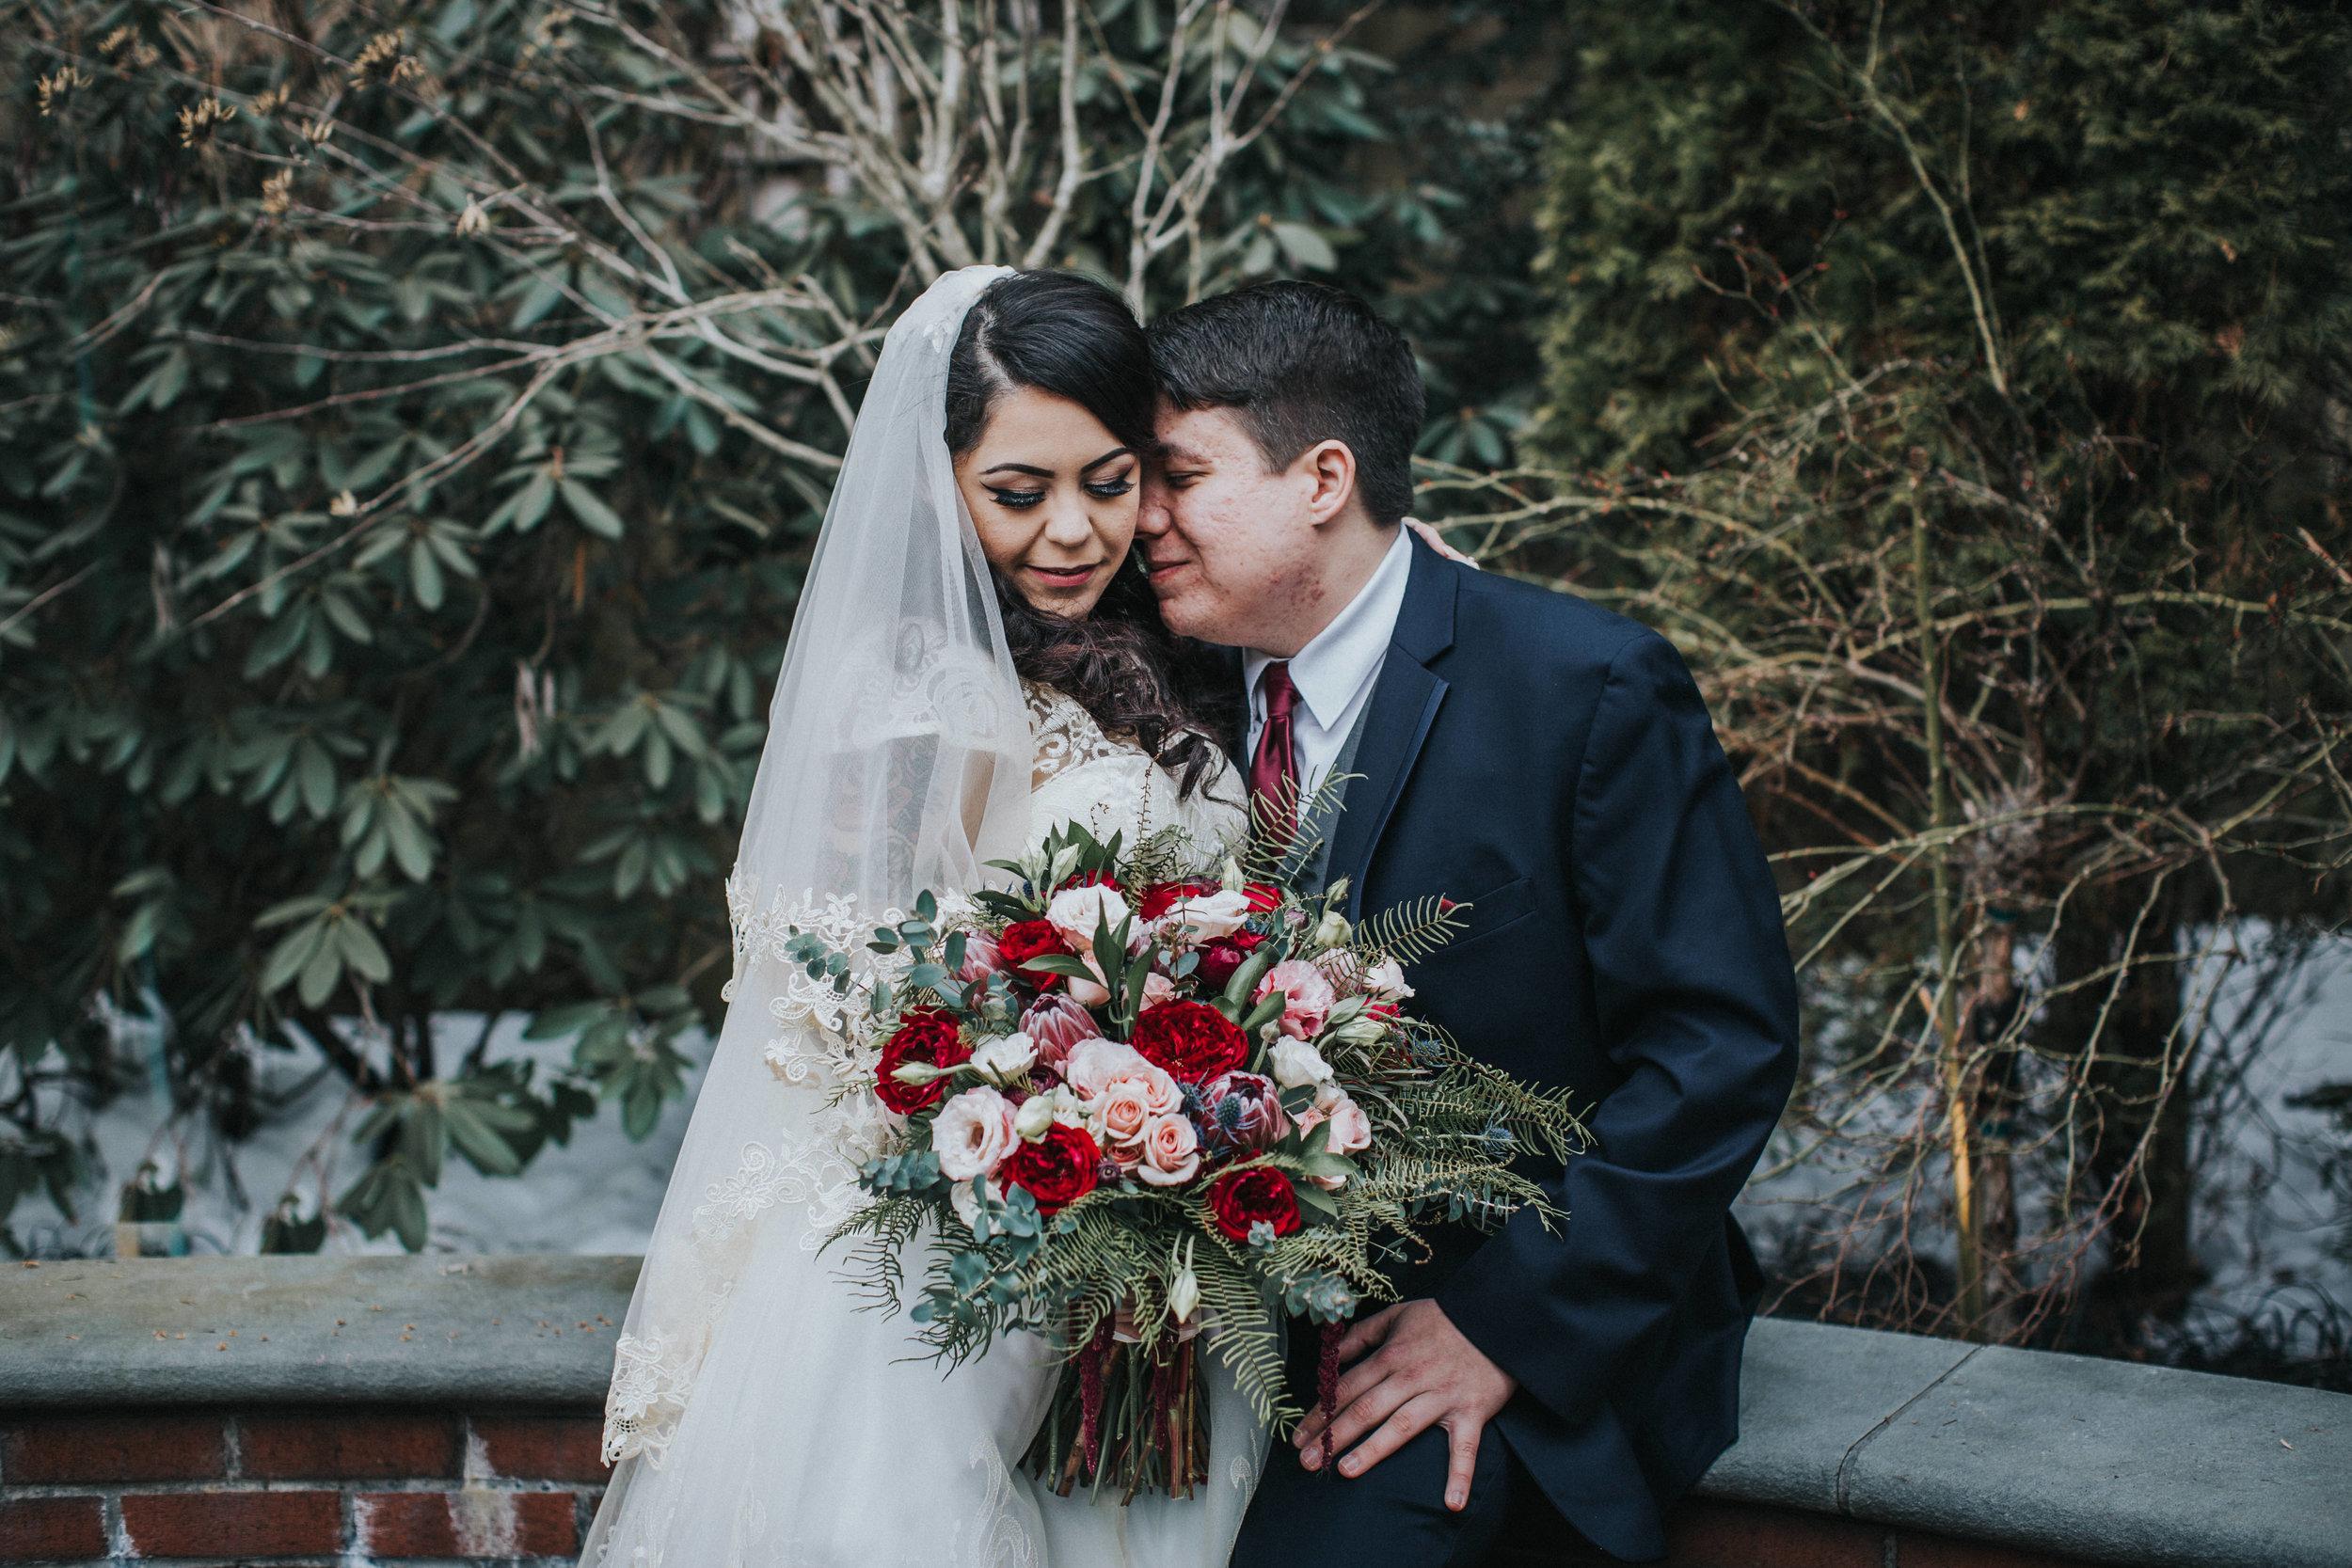 New-Jersey-Wedding-Photographer-ReceptionCenter-Valeria&Mike-First-Look-Bride&Groom (31 of 69).jpg